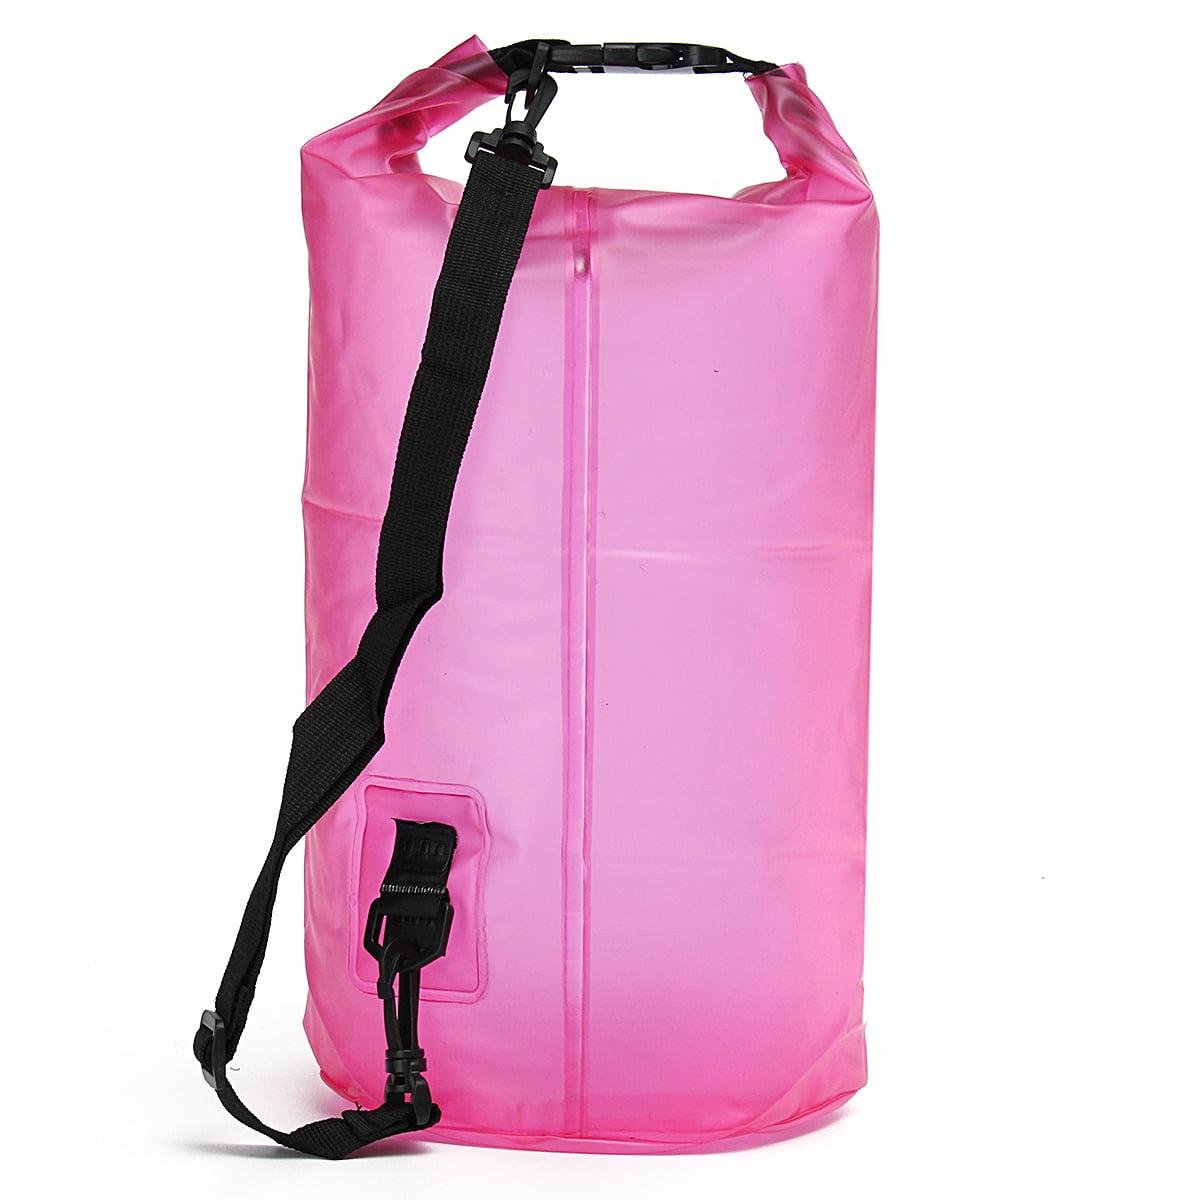 15L Waterproof Dry Bag Drifiting Rafting Canoeing Floating Kayaking Swimming Rucksacks Pouch Pack